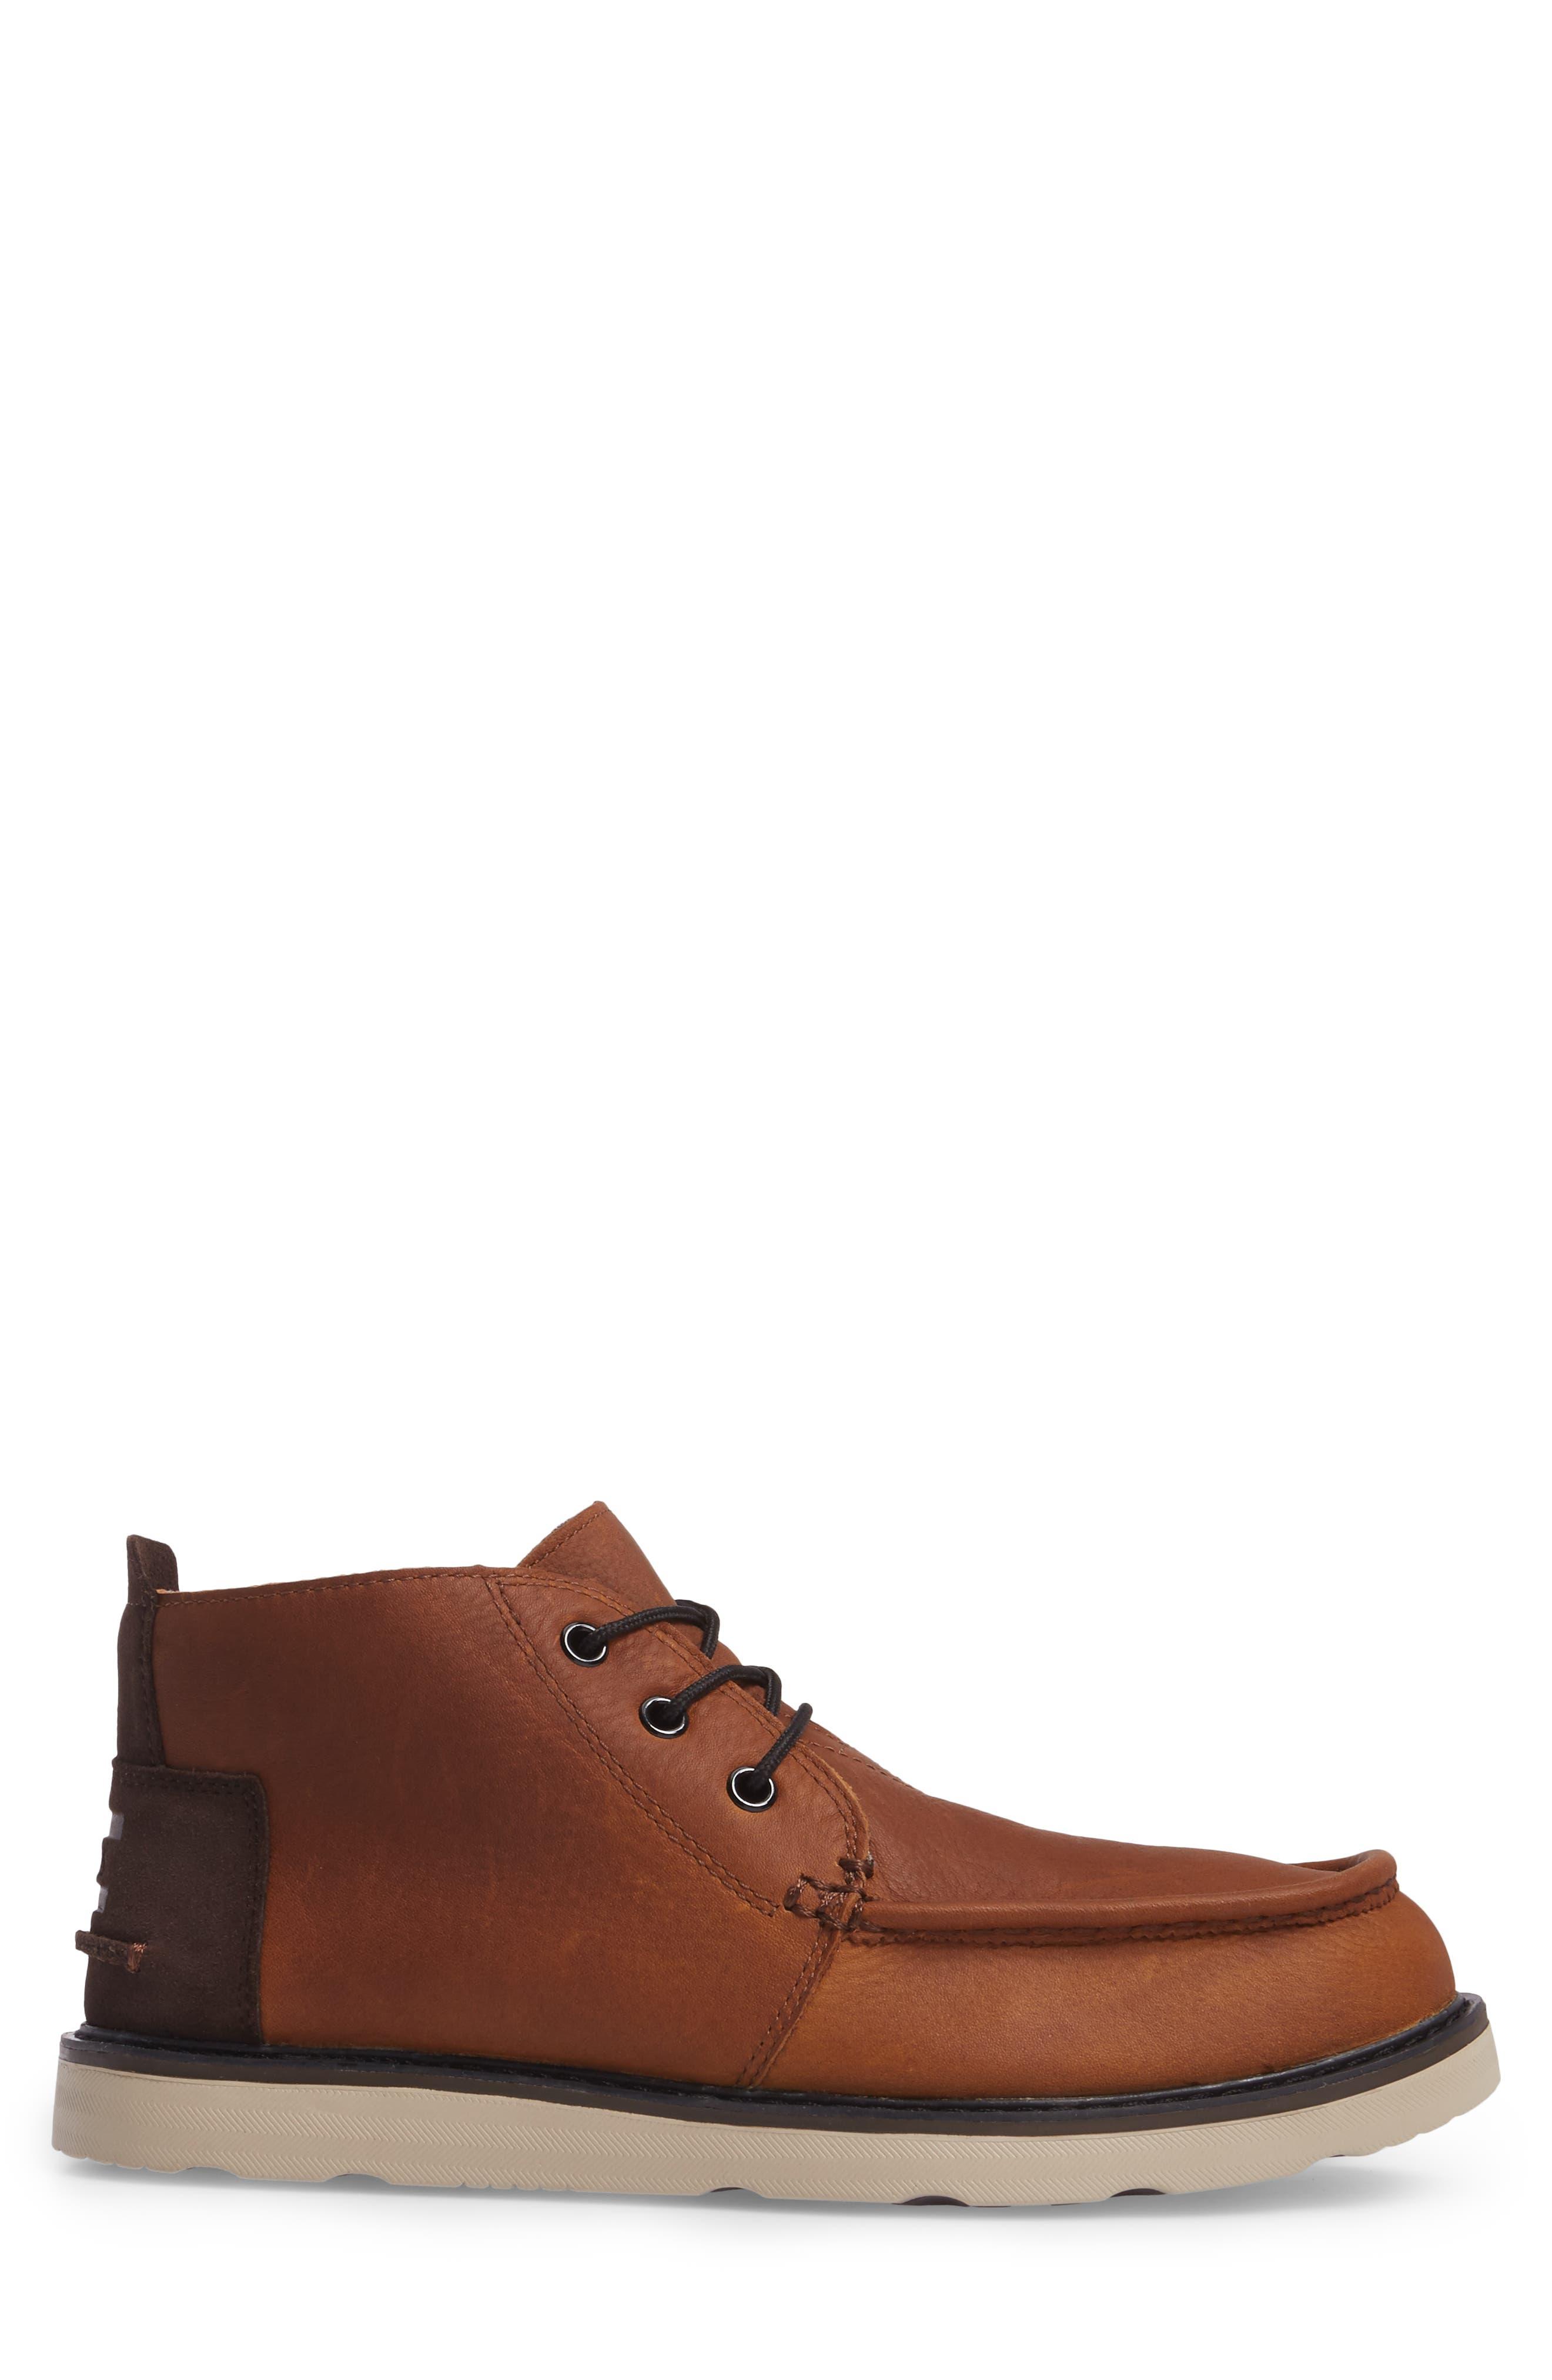 Waterproof Chukka Boot,                             Alternate thumbnail 15, color,